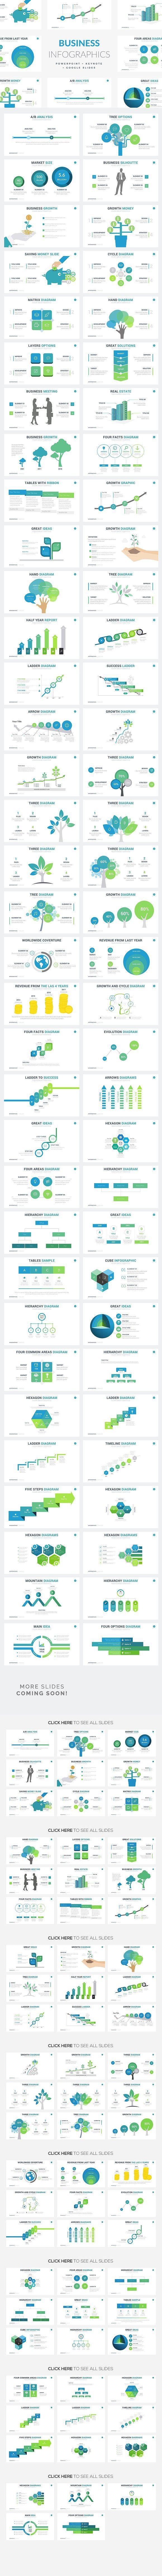 Business Infographics | PPT KEY GS. Presentation Templates